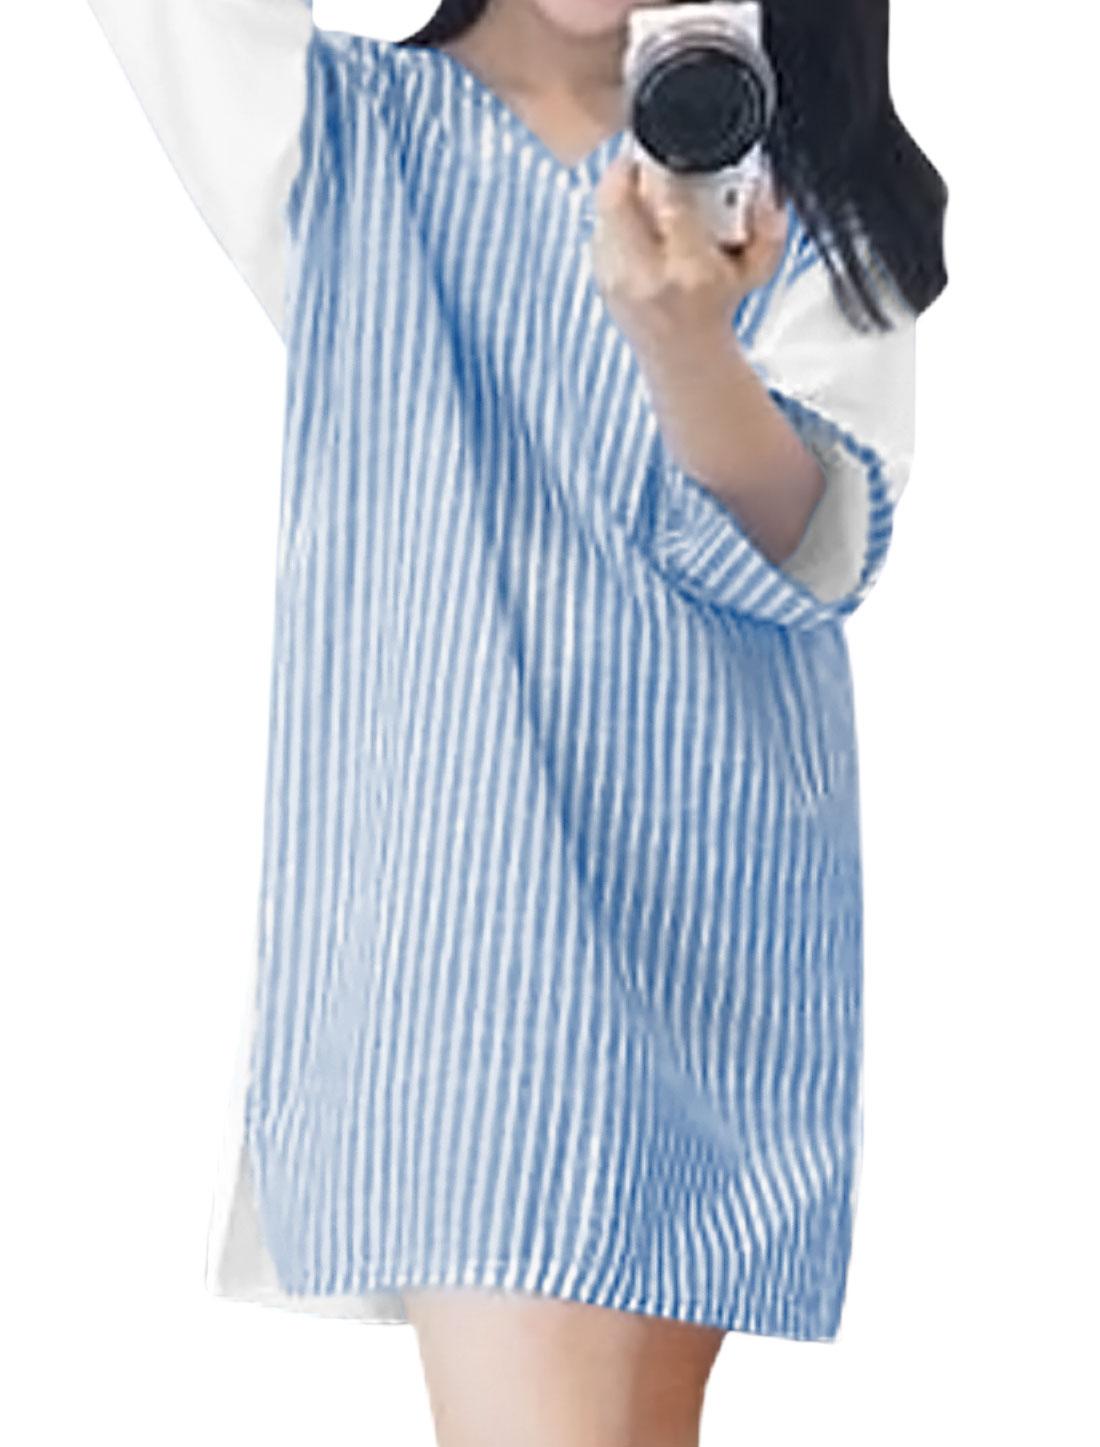 Women-V-Neck-Kimono-Sleeves-Stripes-Contrast-Color-Loose-Tunic-Dress